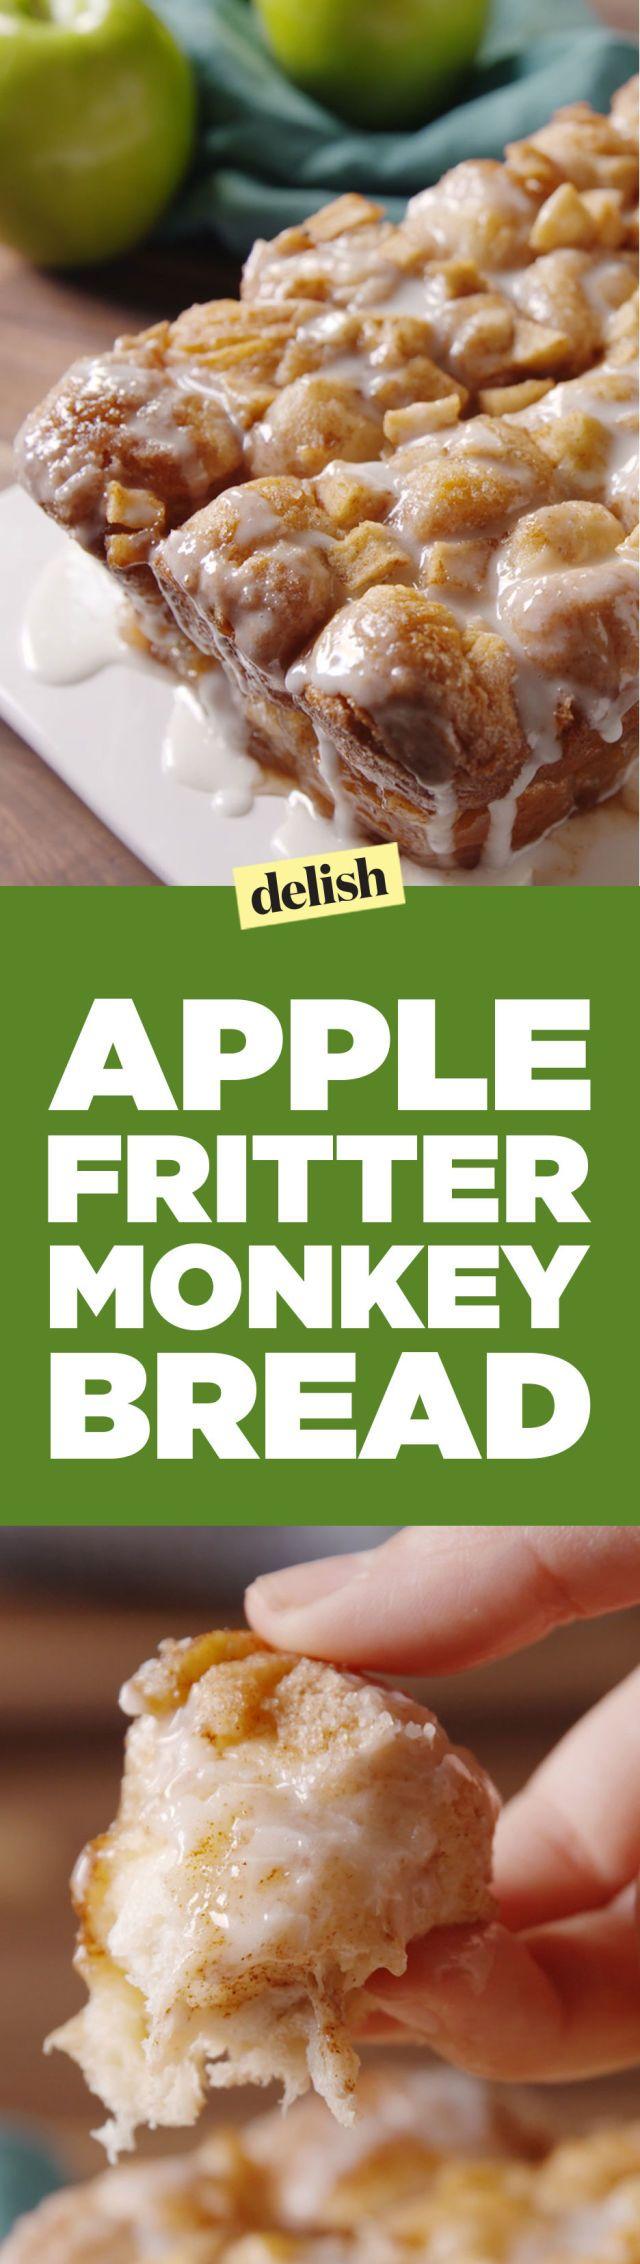 http://www.delish.com/cooking/recipe-ideas/recipes/a49722/apple-fritter-monkey-bread-recipe/